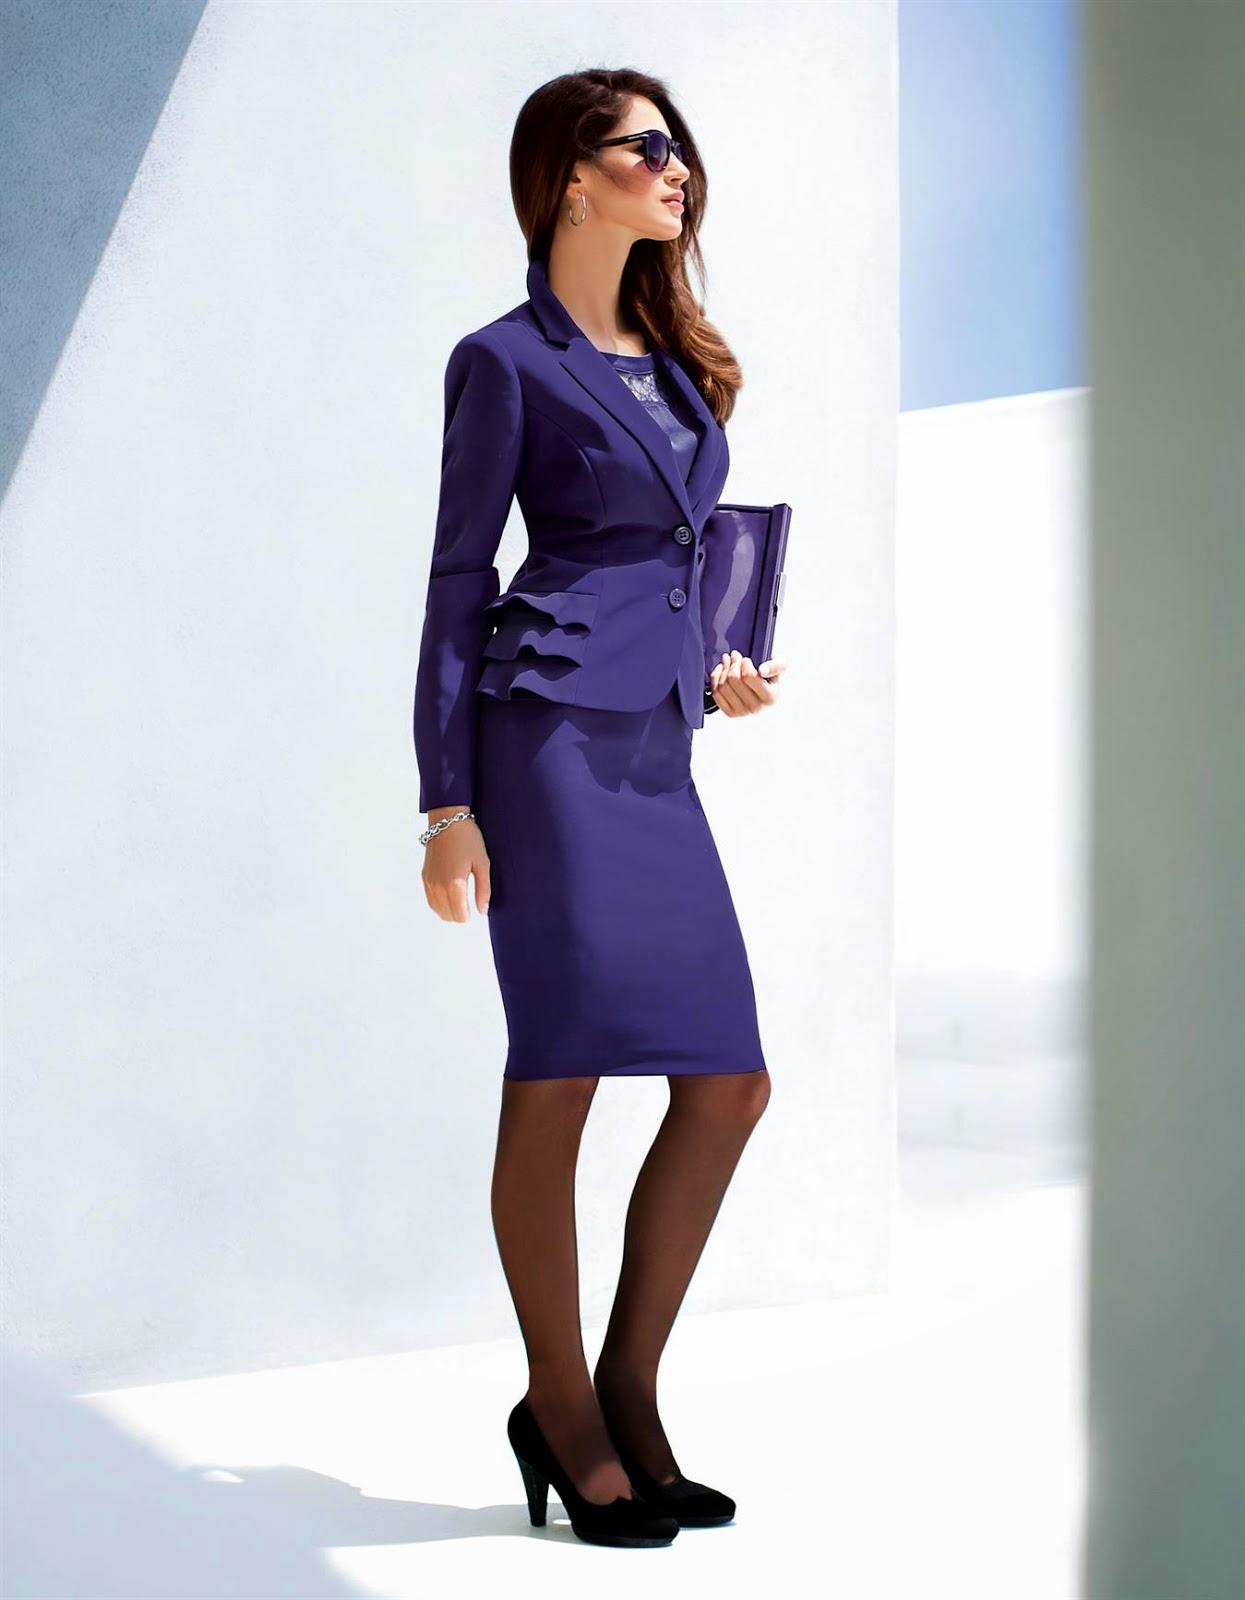 Uniformes De Moda Para Empresasuniformes trajes sastres look,  barrington, catalogo 2014 moda mujer ejecutiva, conjuntos para damas, moda,  moda ejecutiva